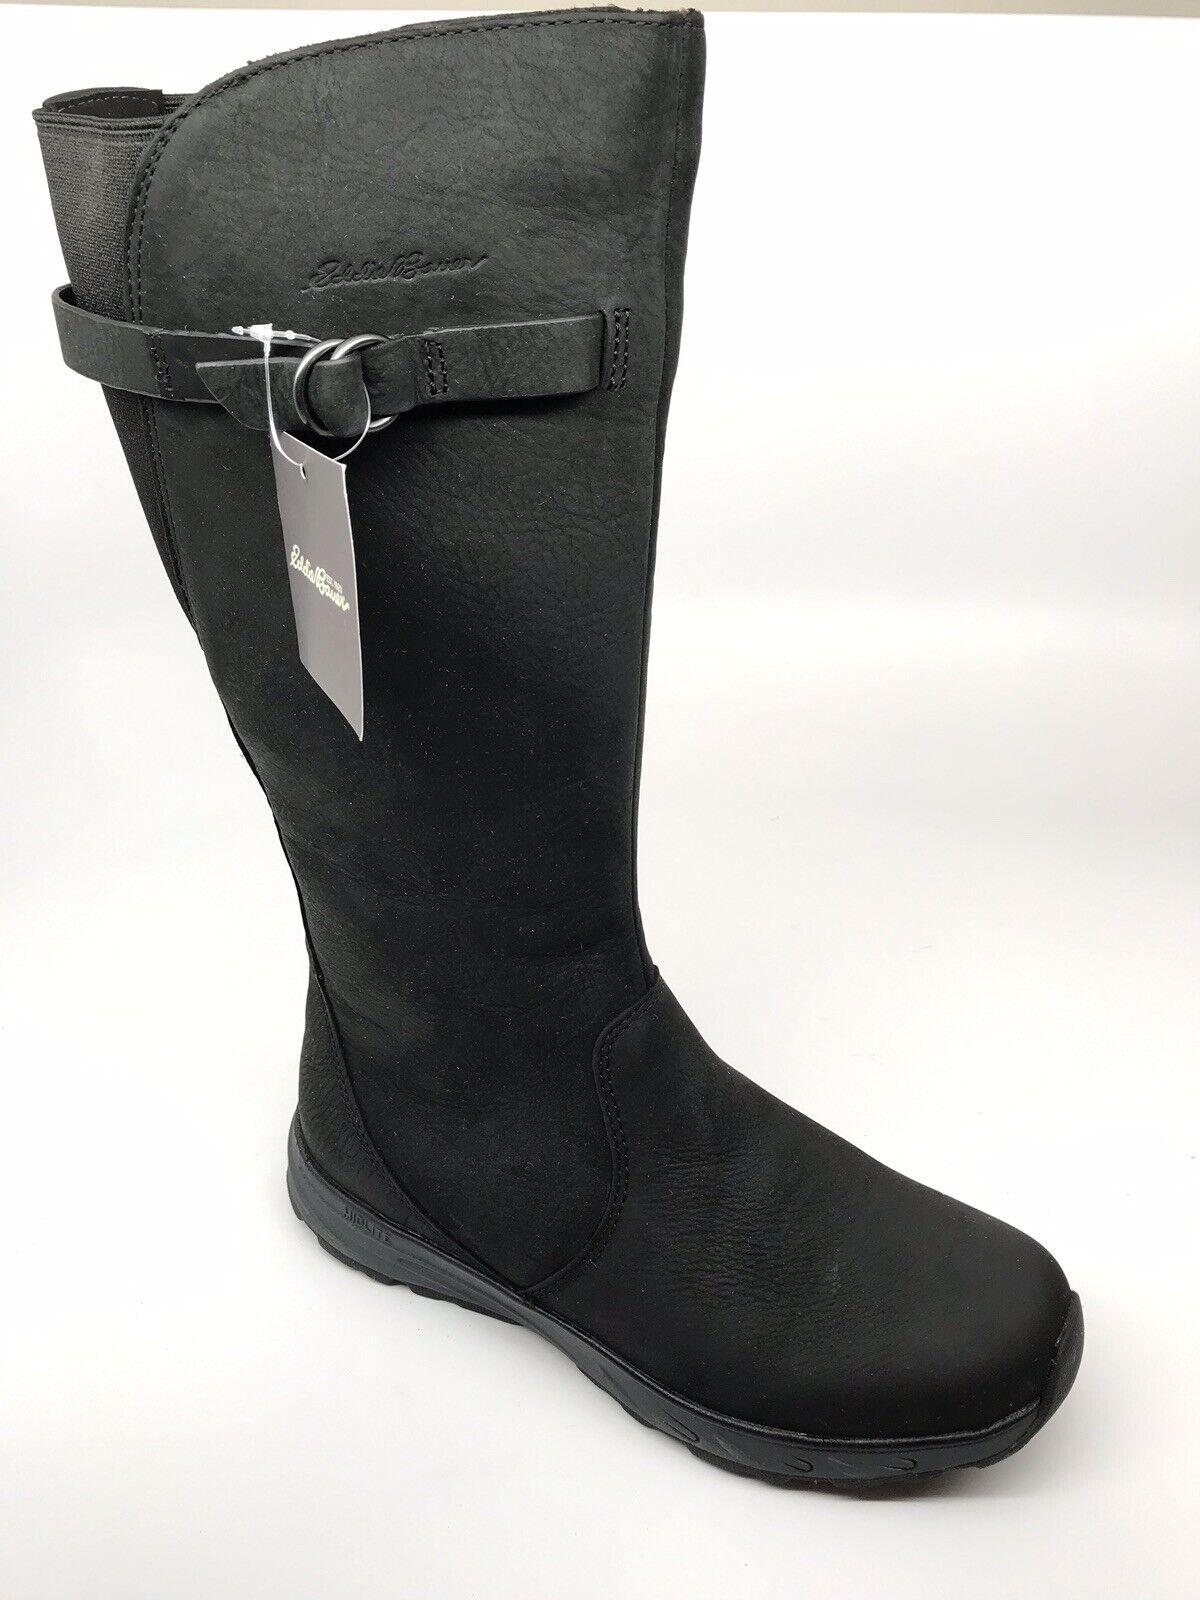 Eddie Bauer Womens Lodge Freeheat Black Leather Boots Size 8 M Waterproof